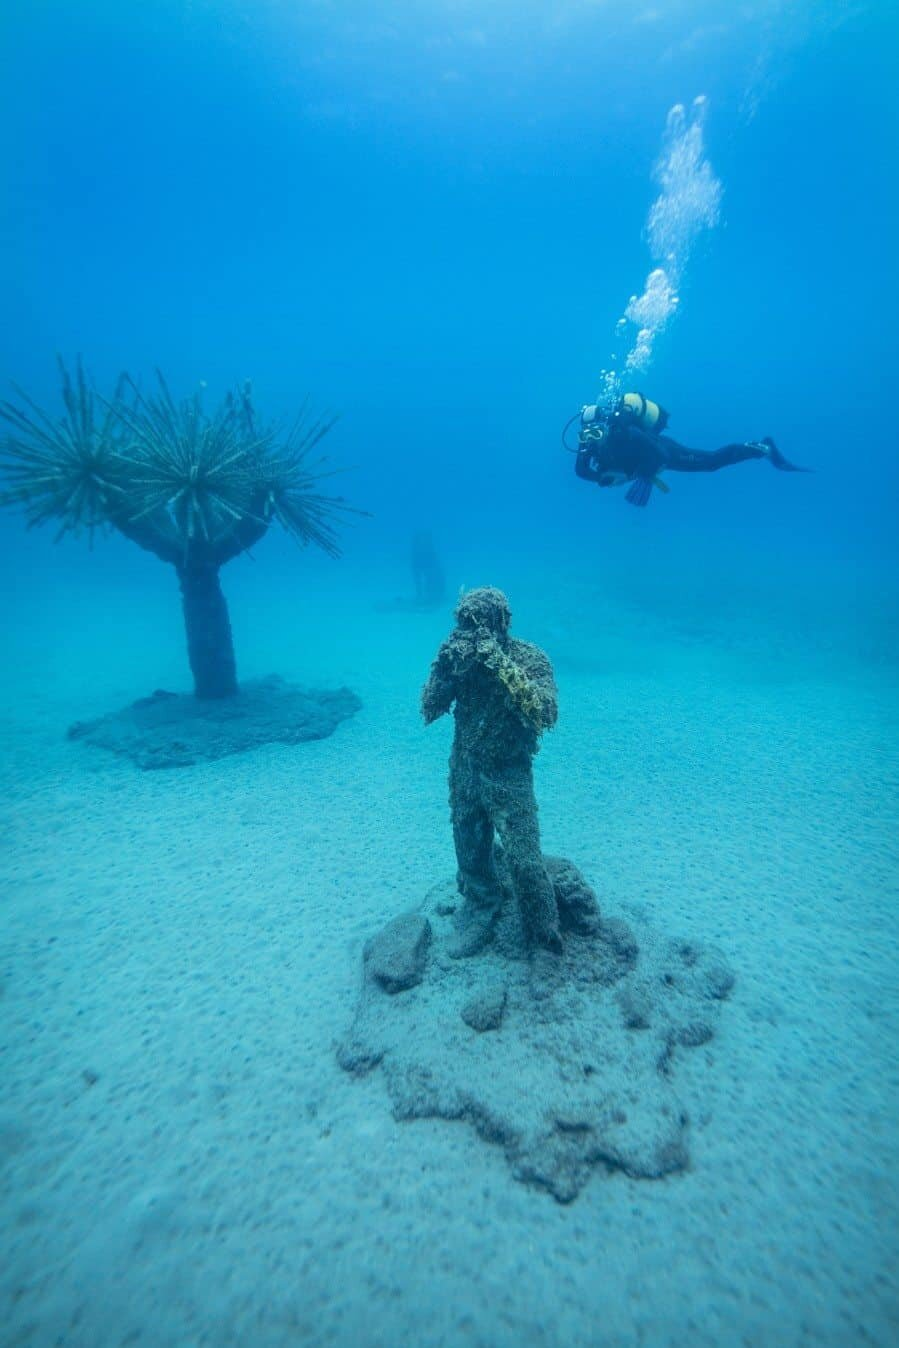 Museo Atlantico Underwater Museum in Europe